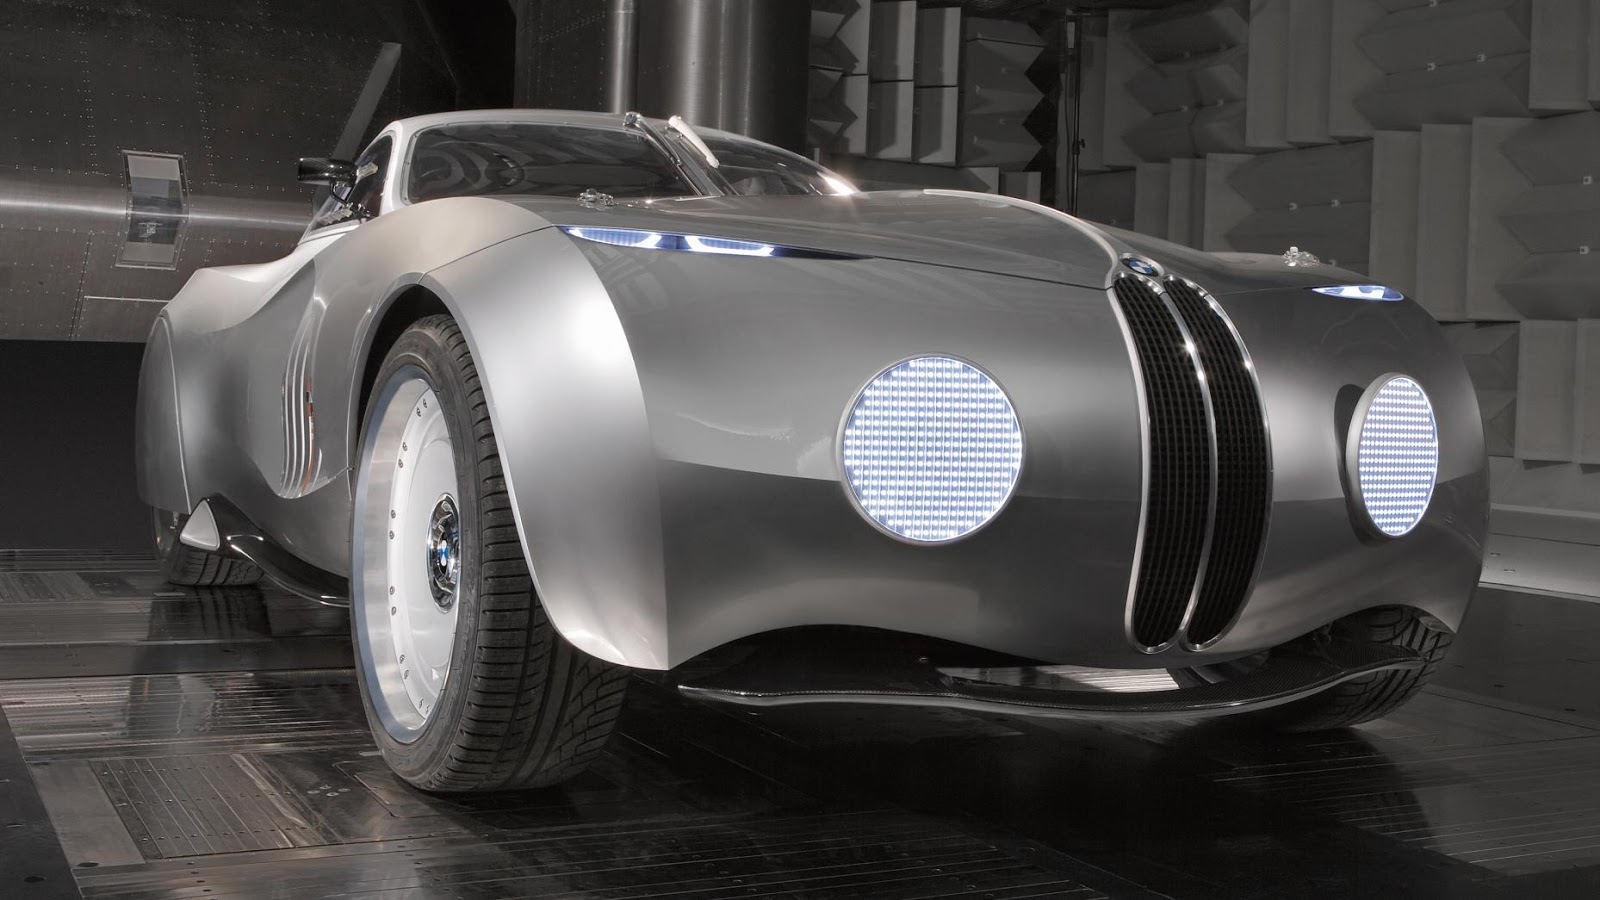 2006: BMW Concept Coupe Mille Miglia